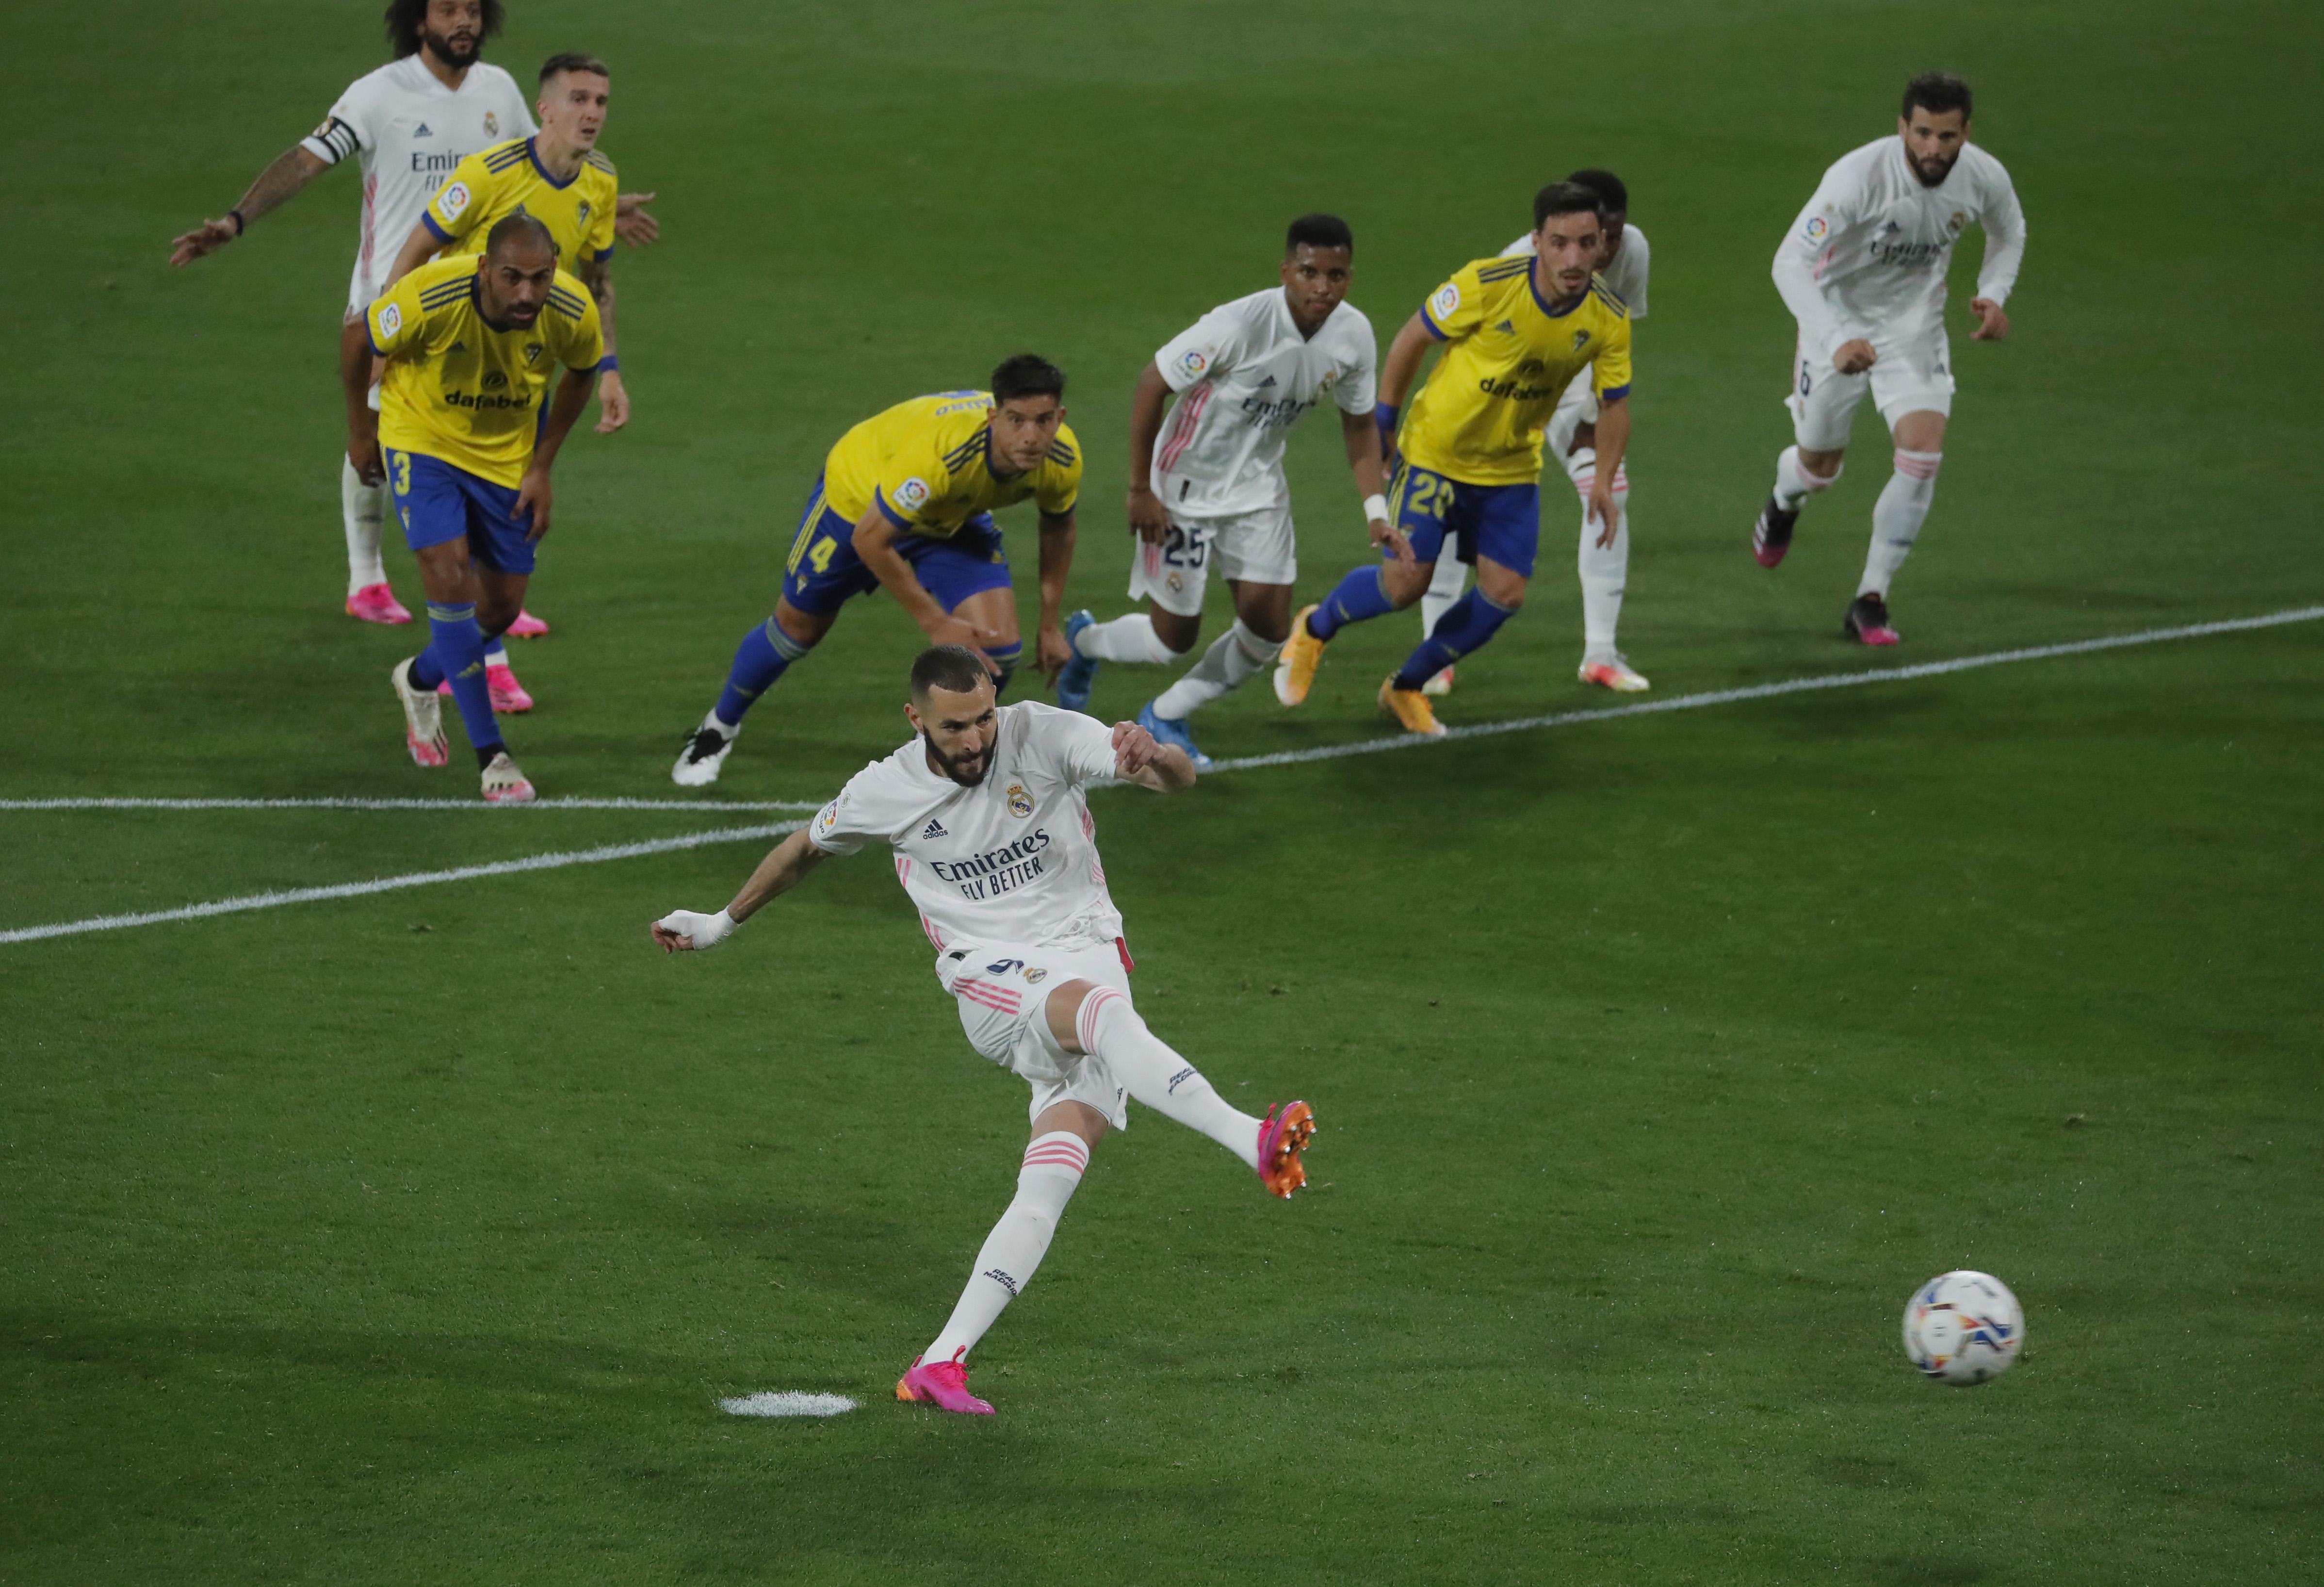 Benzena marca de penalti el primer gol del Madrid.